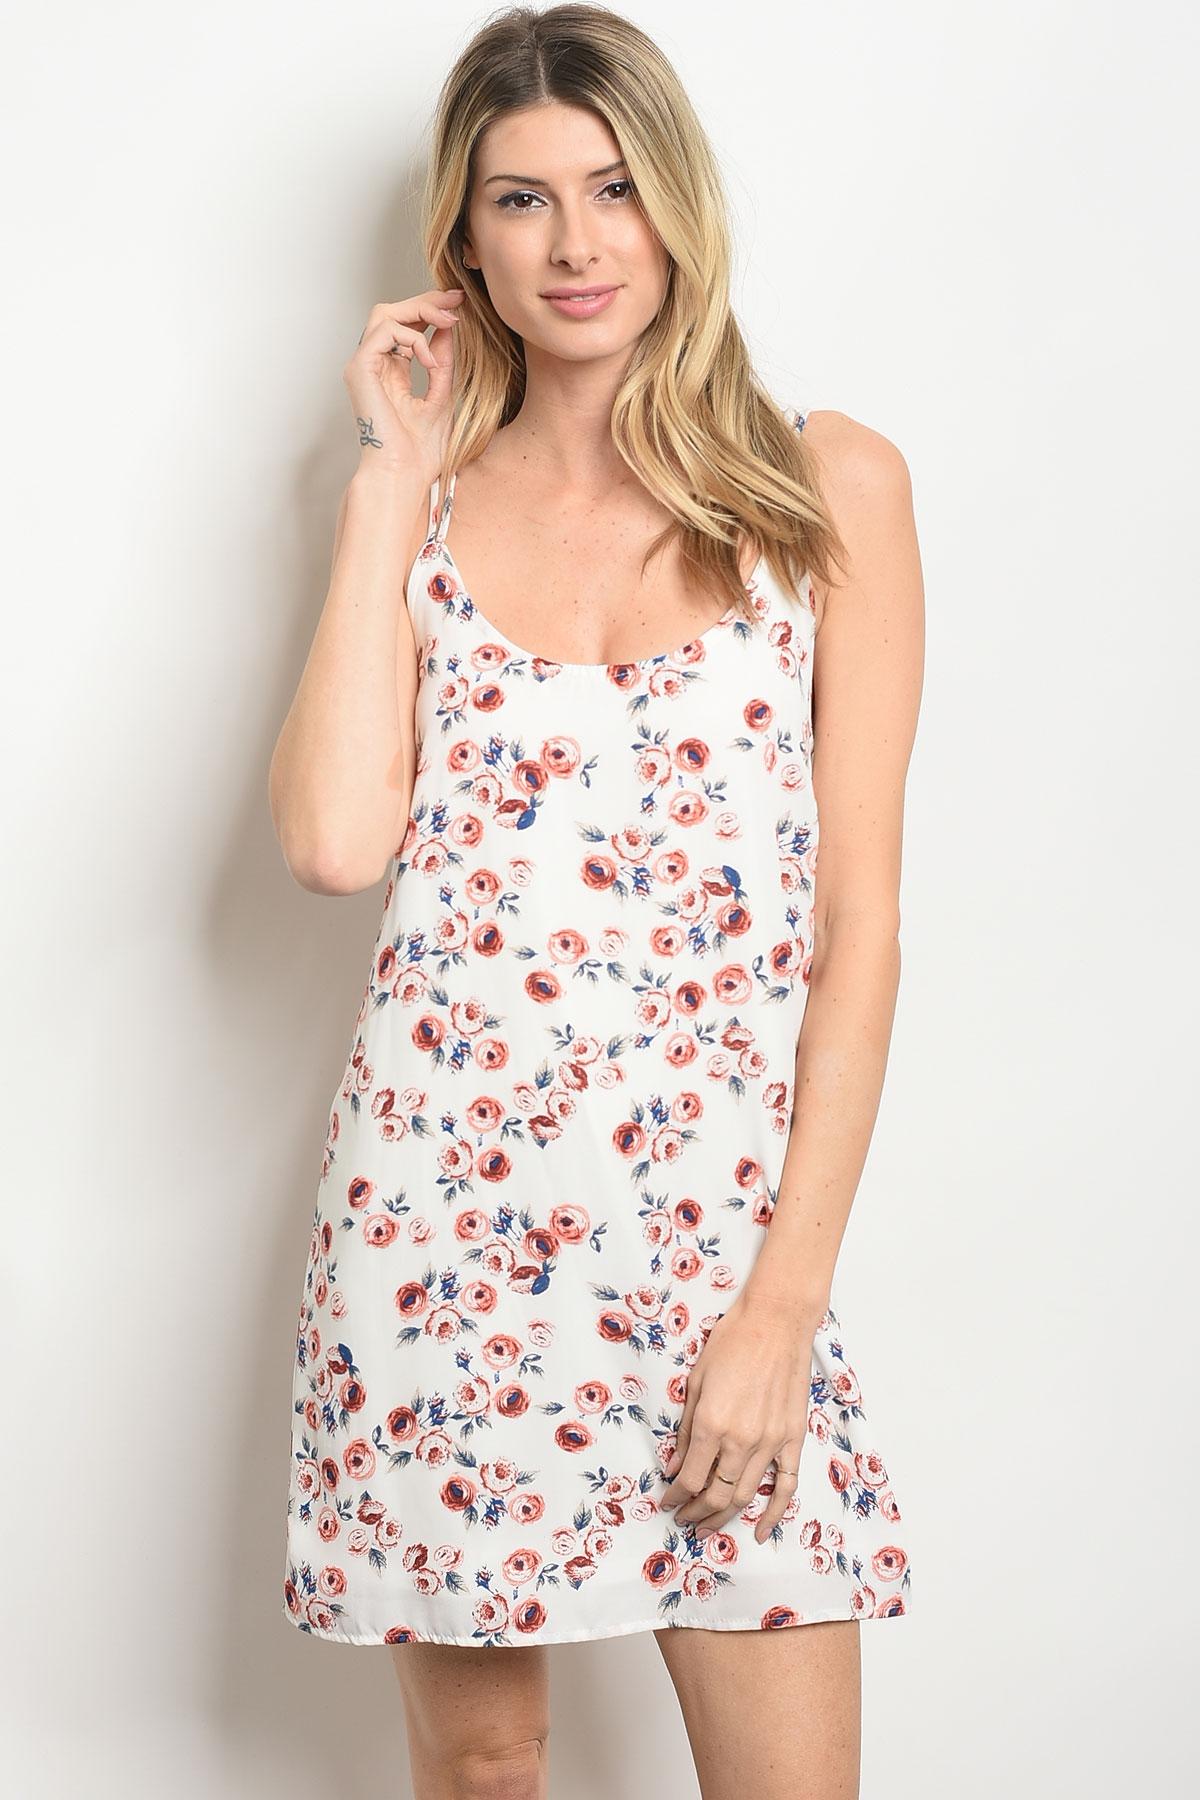 C10 A 5 D66806 White Flower Print Dress 2 2 2